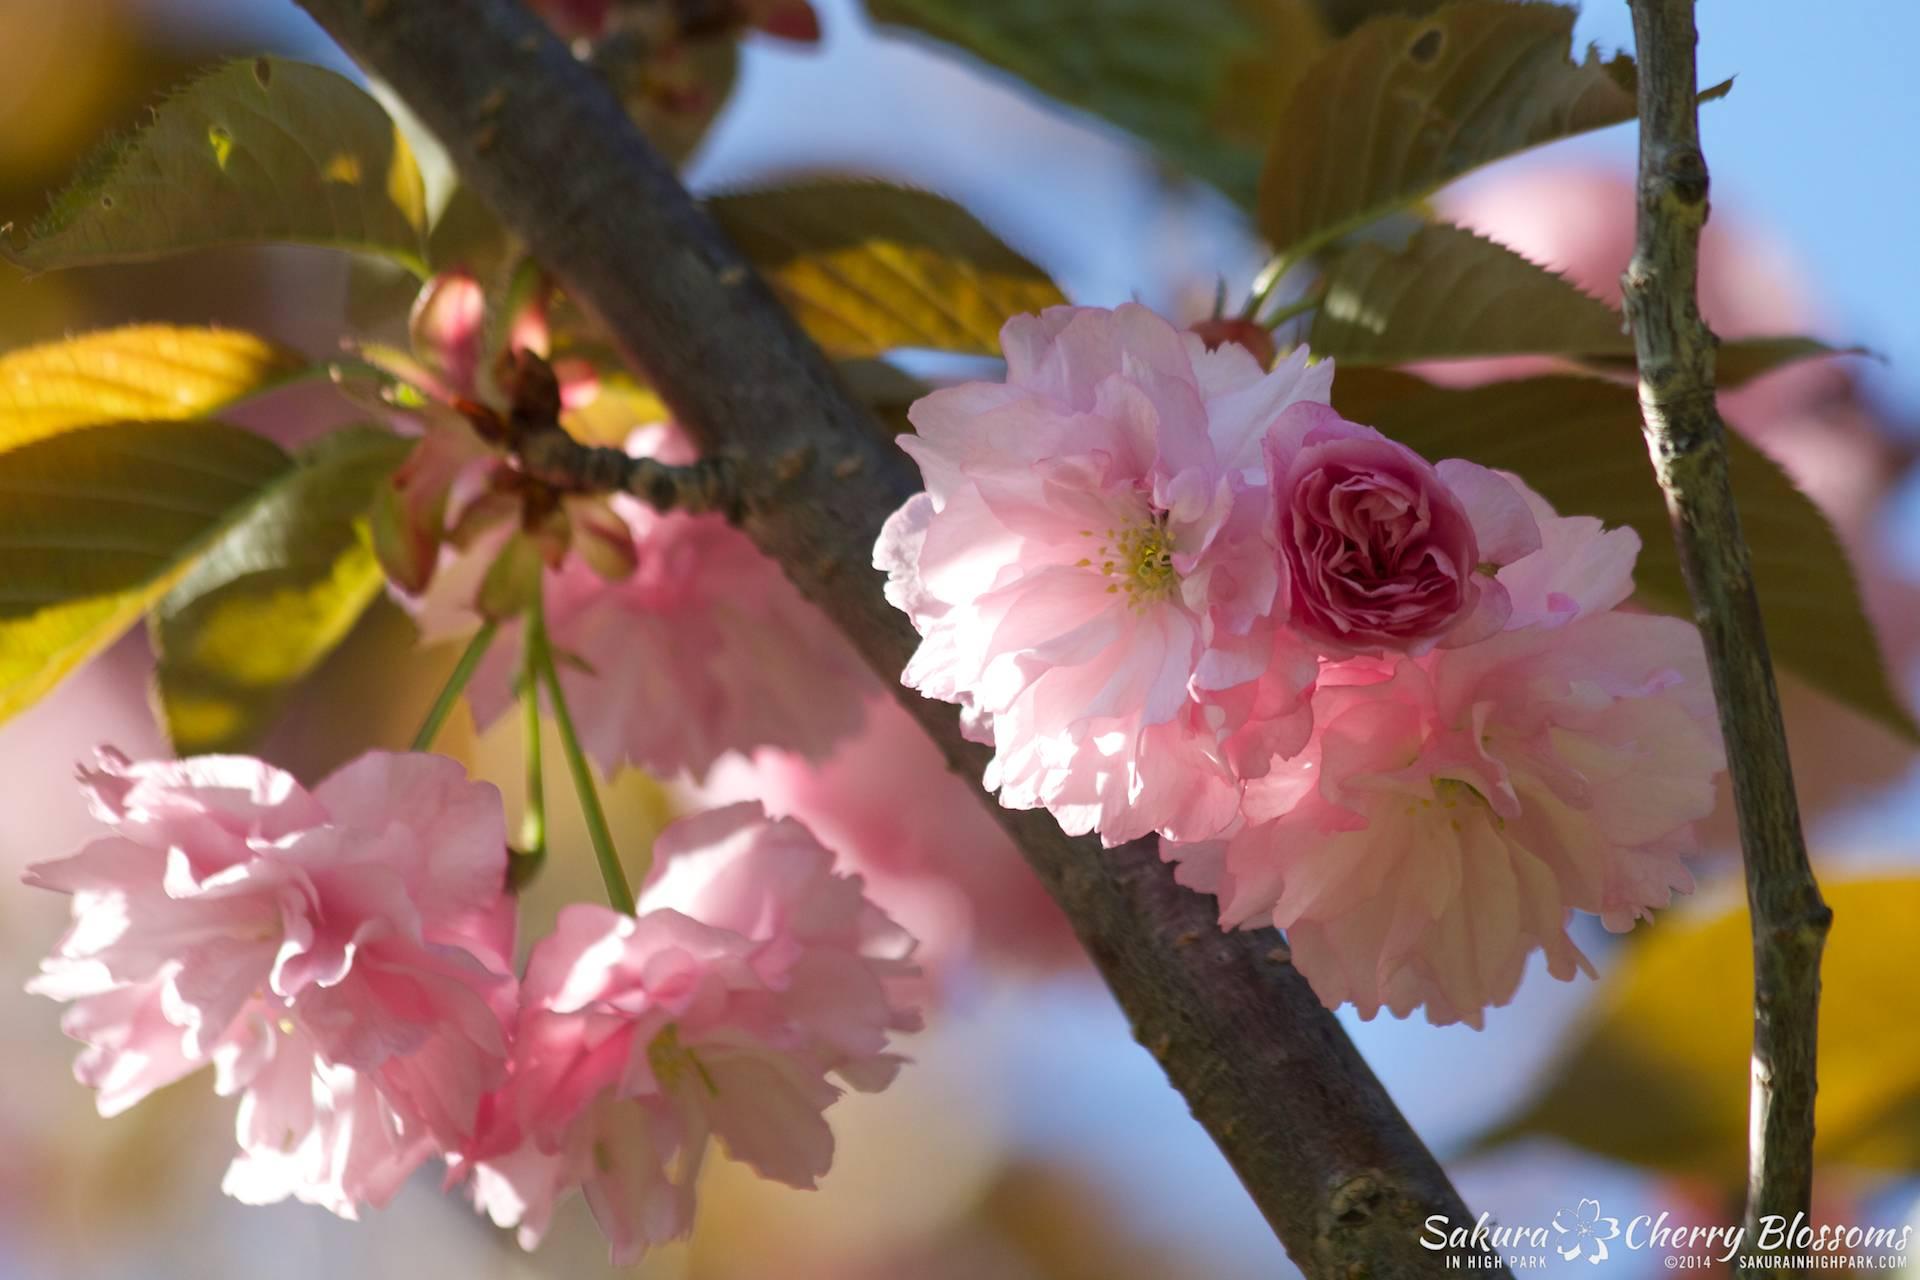 SakuraInHighPark-May2414-515.jpg